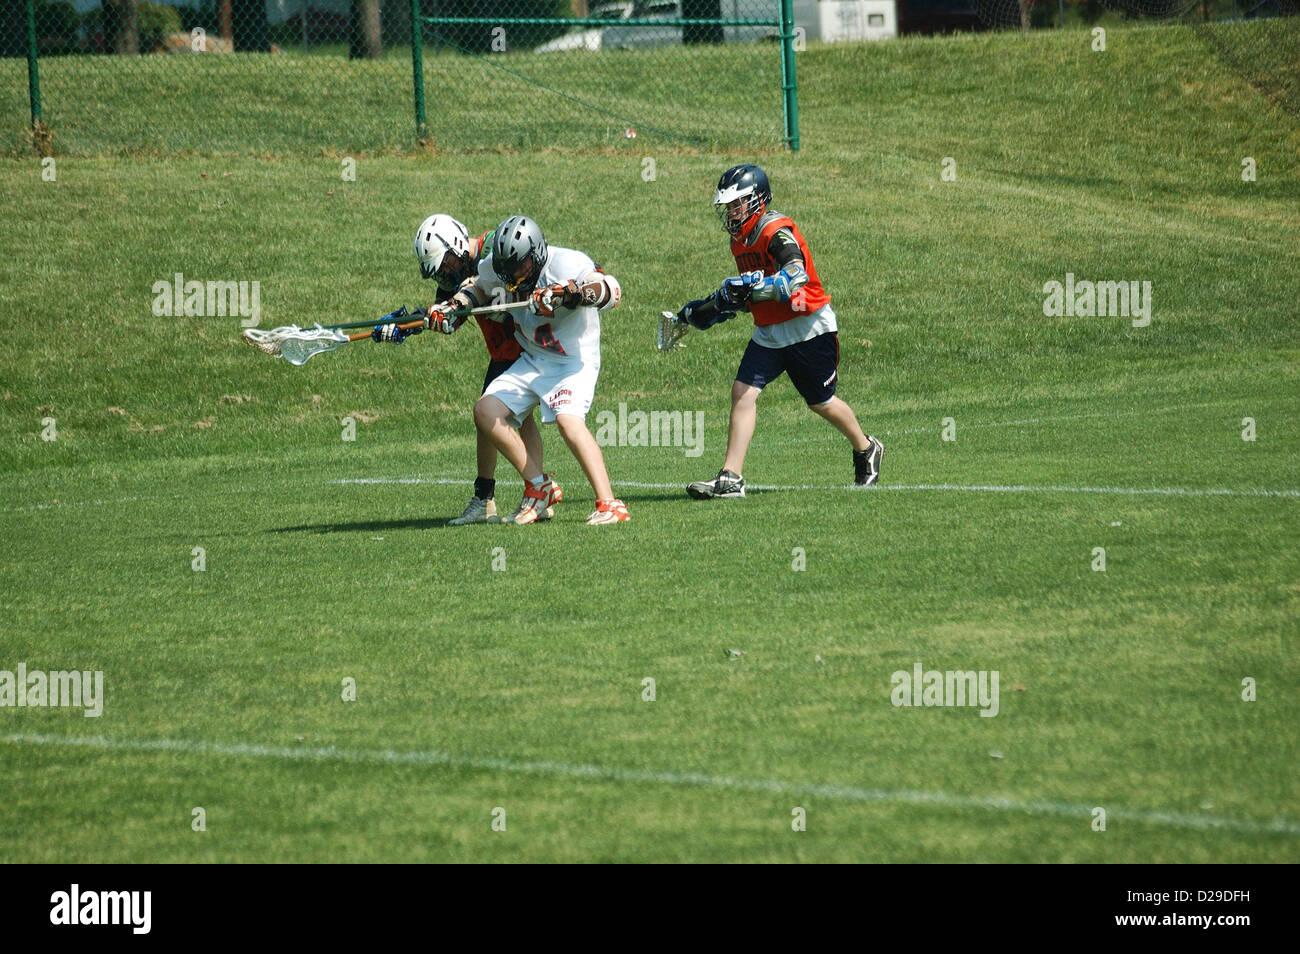 Virginia, Lacrosse-Spiel Stockfoto